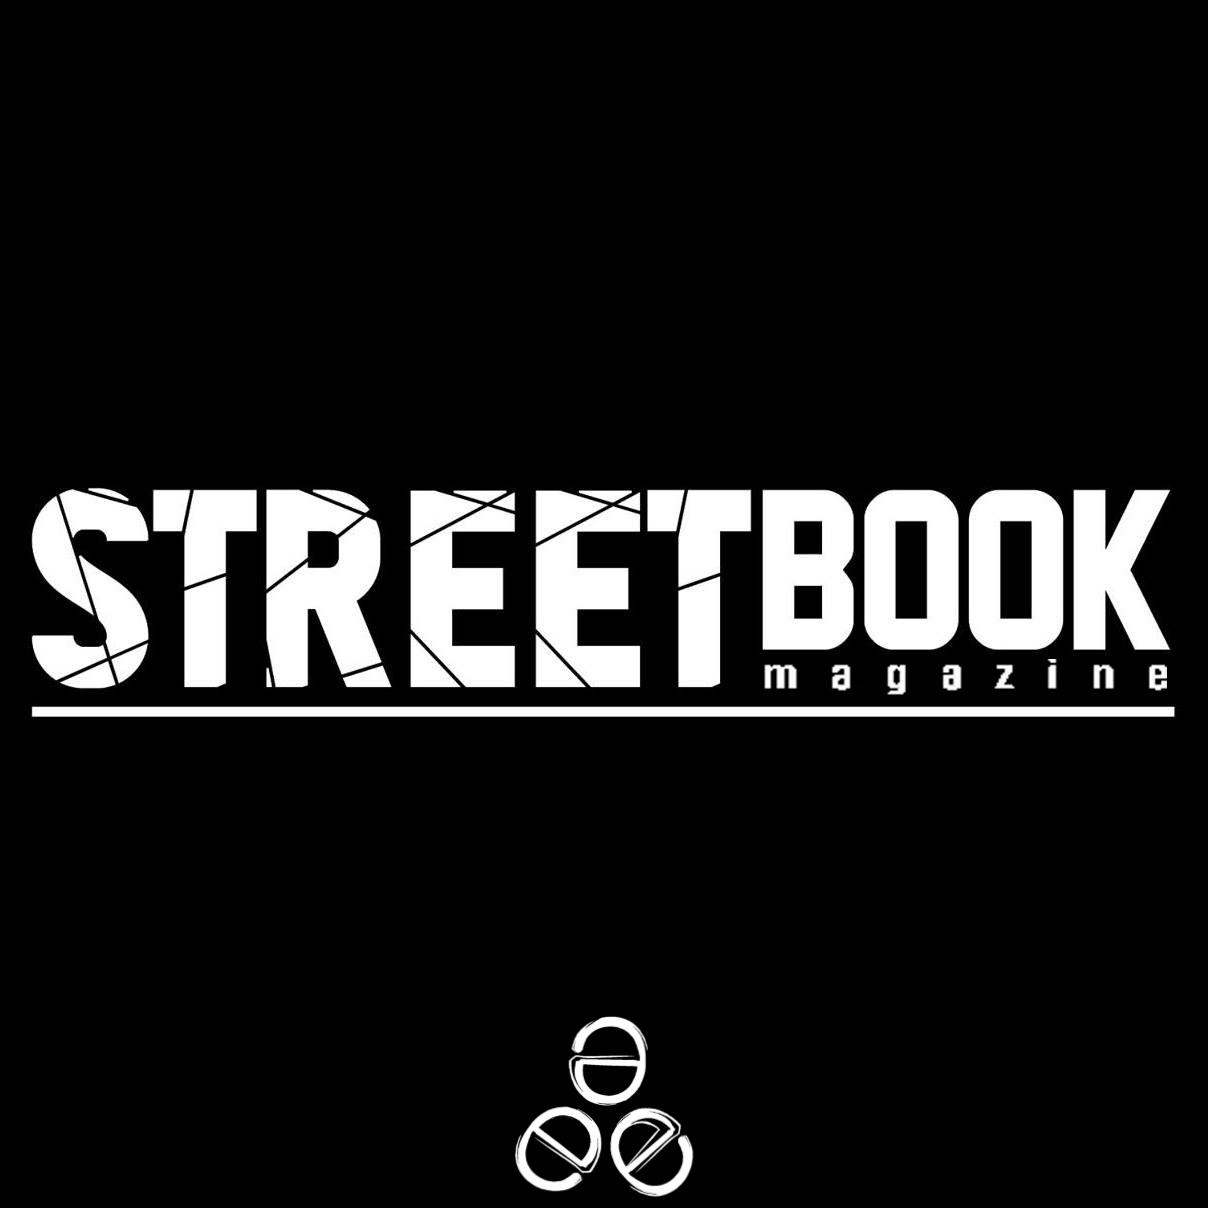 profilo-fb-streetbook